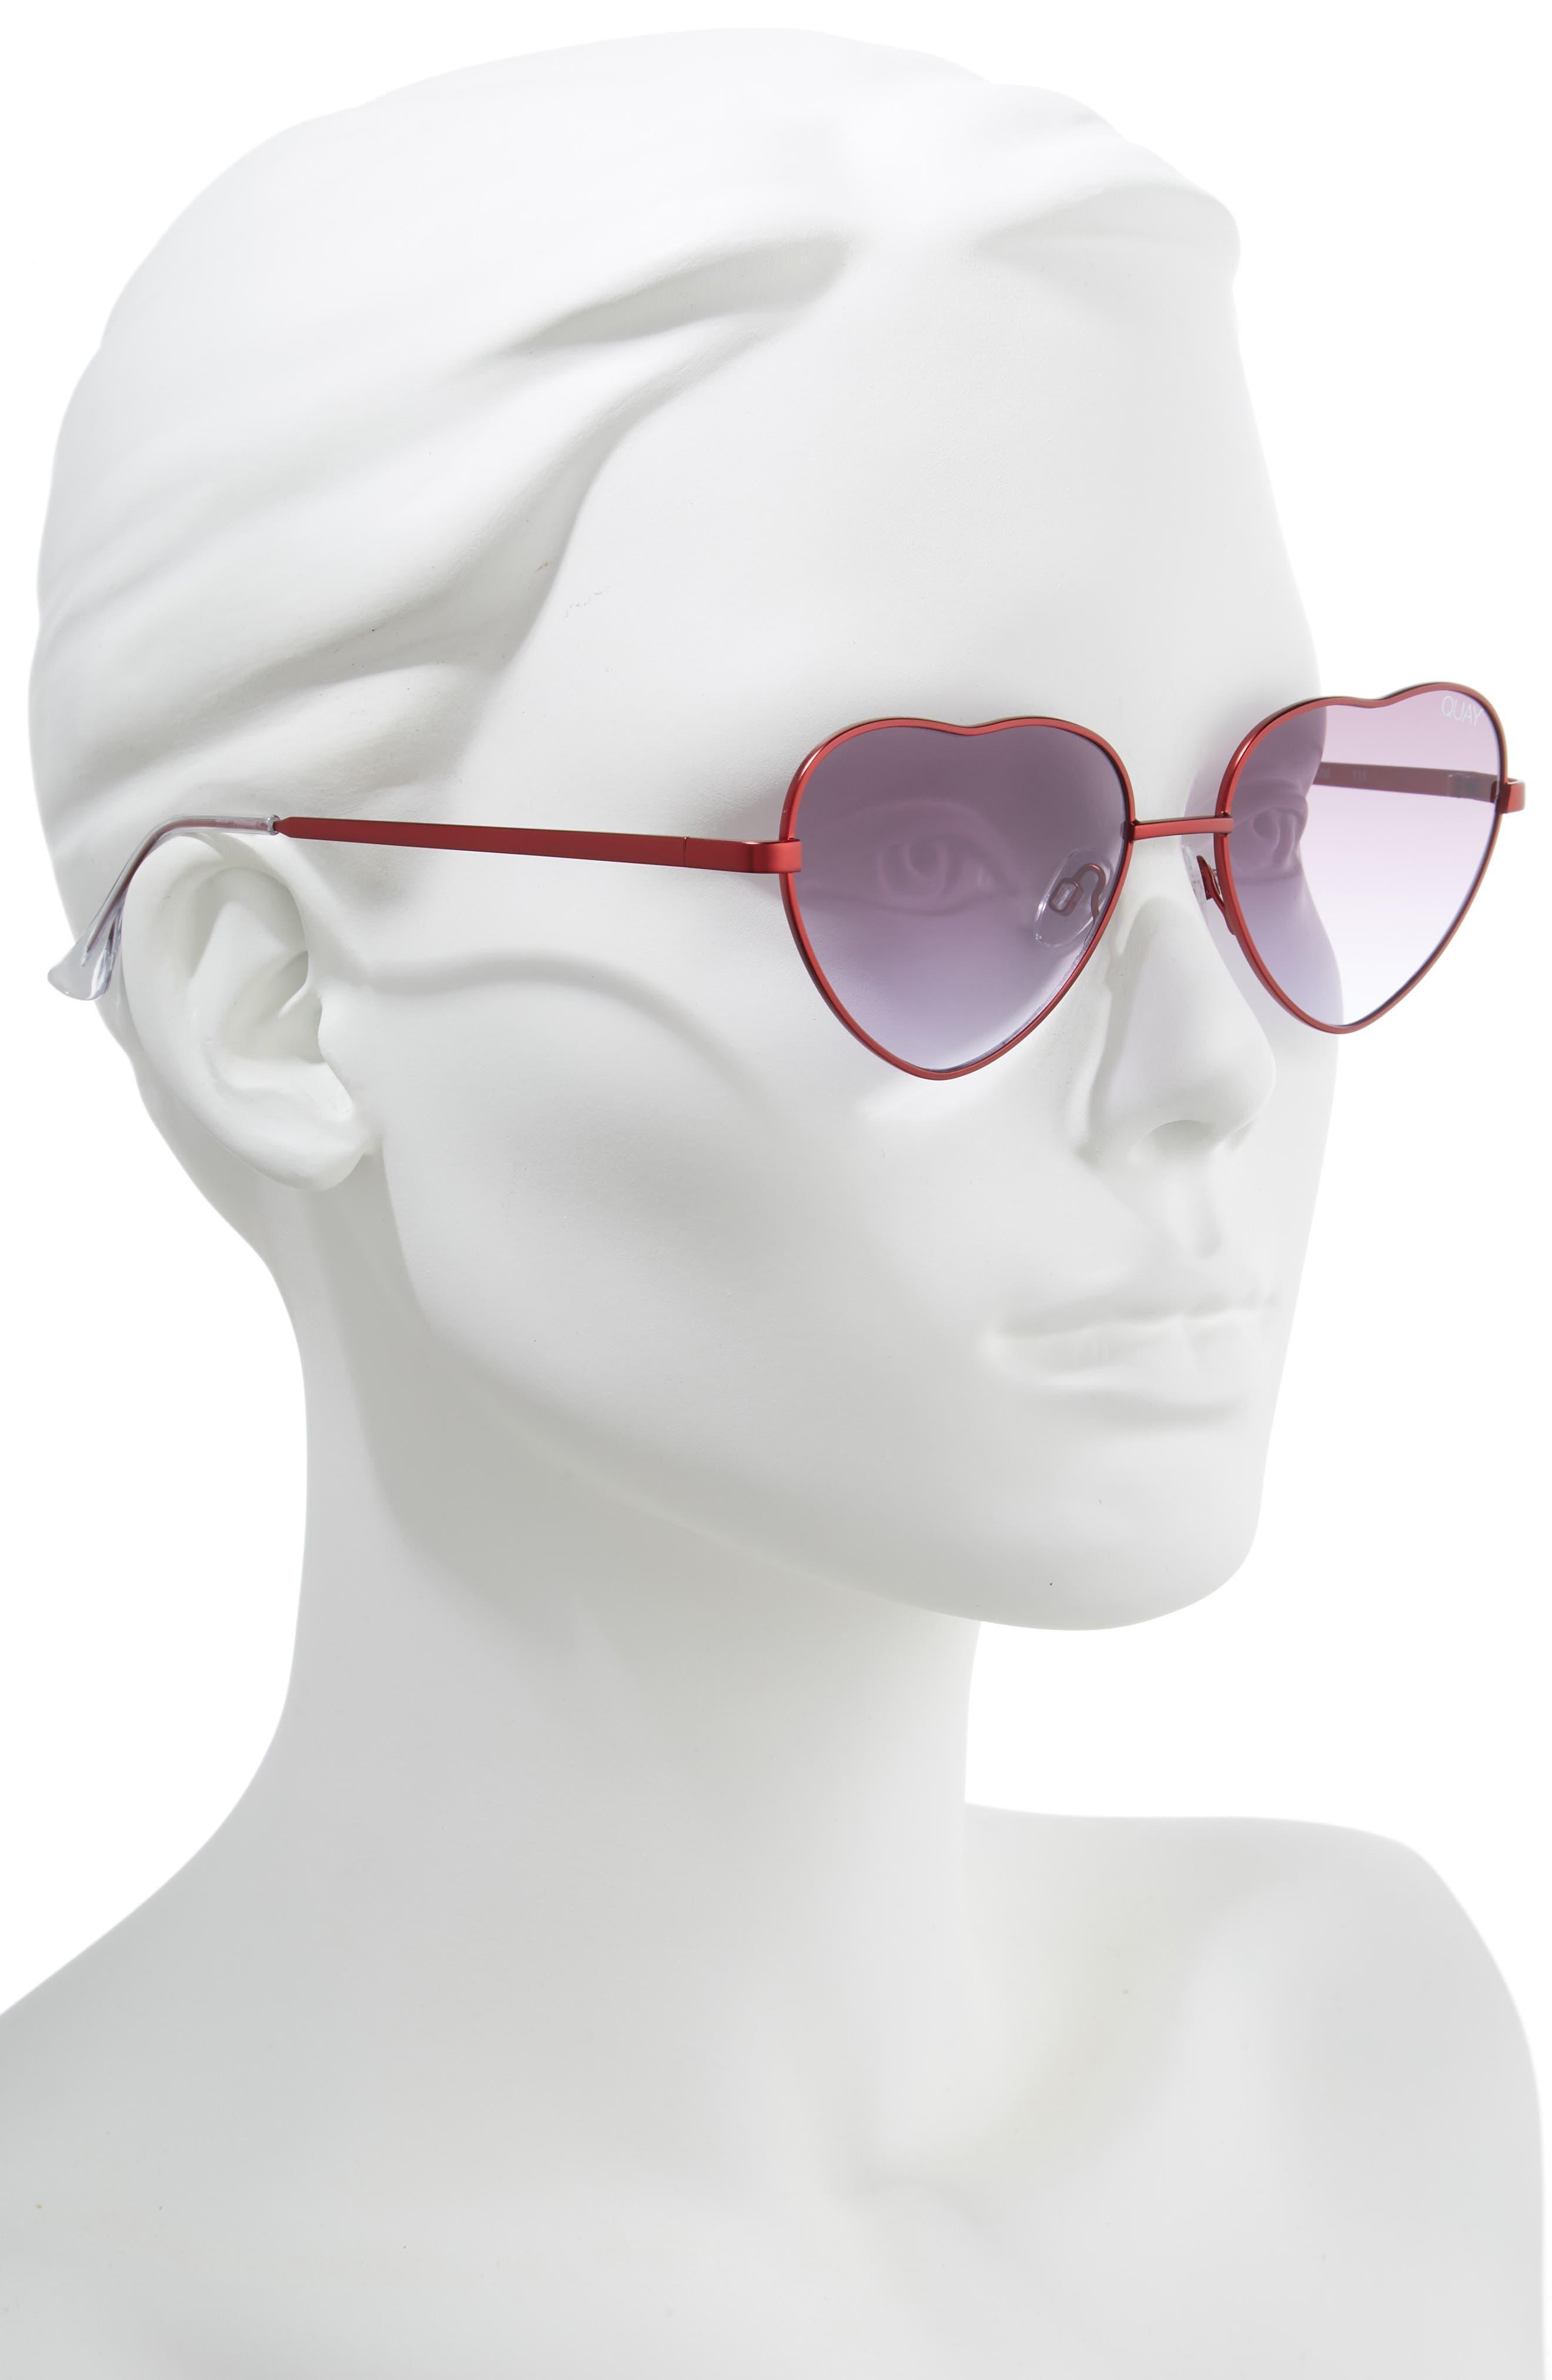 x Elle Ferguson Kim 55mm Heart Sunglasses,                             Alternate thumbnail 2, color,                             RED/ PURPLE FADE